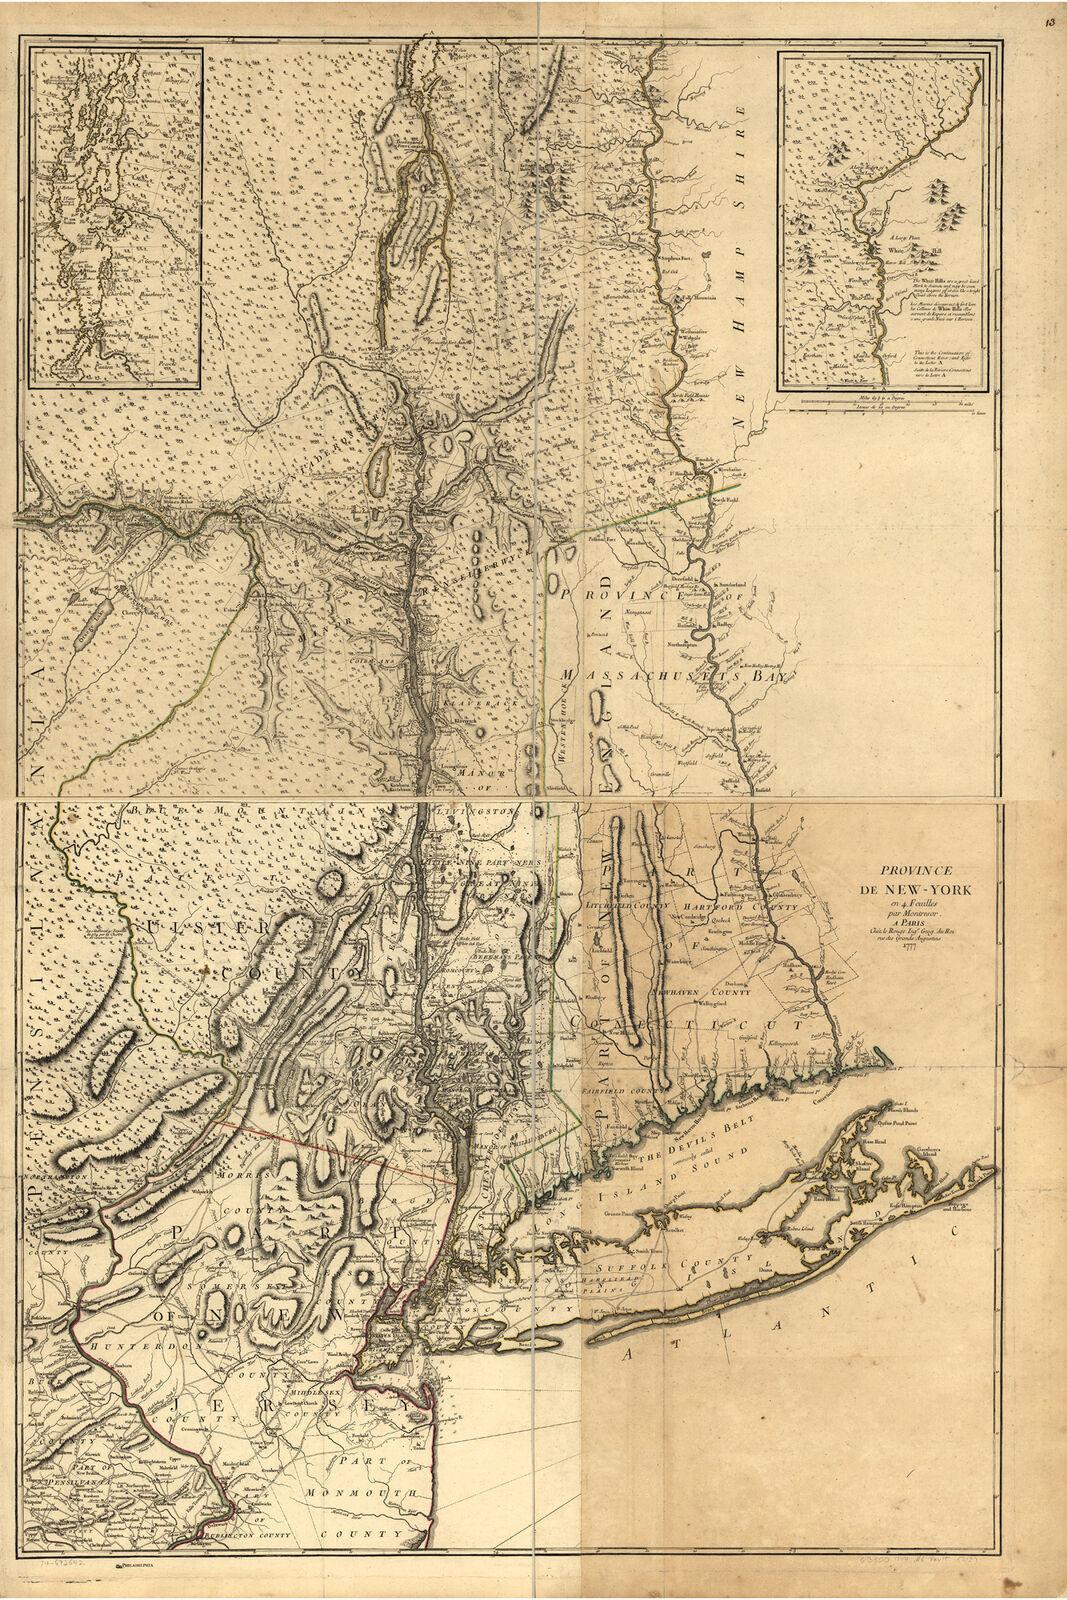 Map of New York, Antique Map, 1777; Province de New-York en 4 Feuilles - $26.72 - $37.61